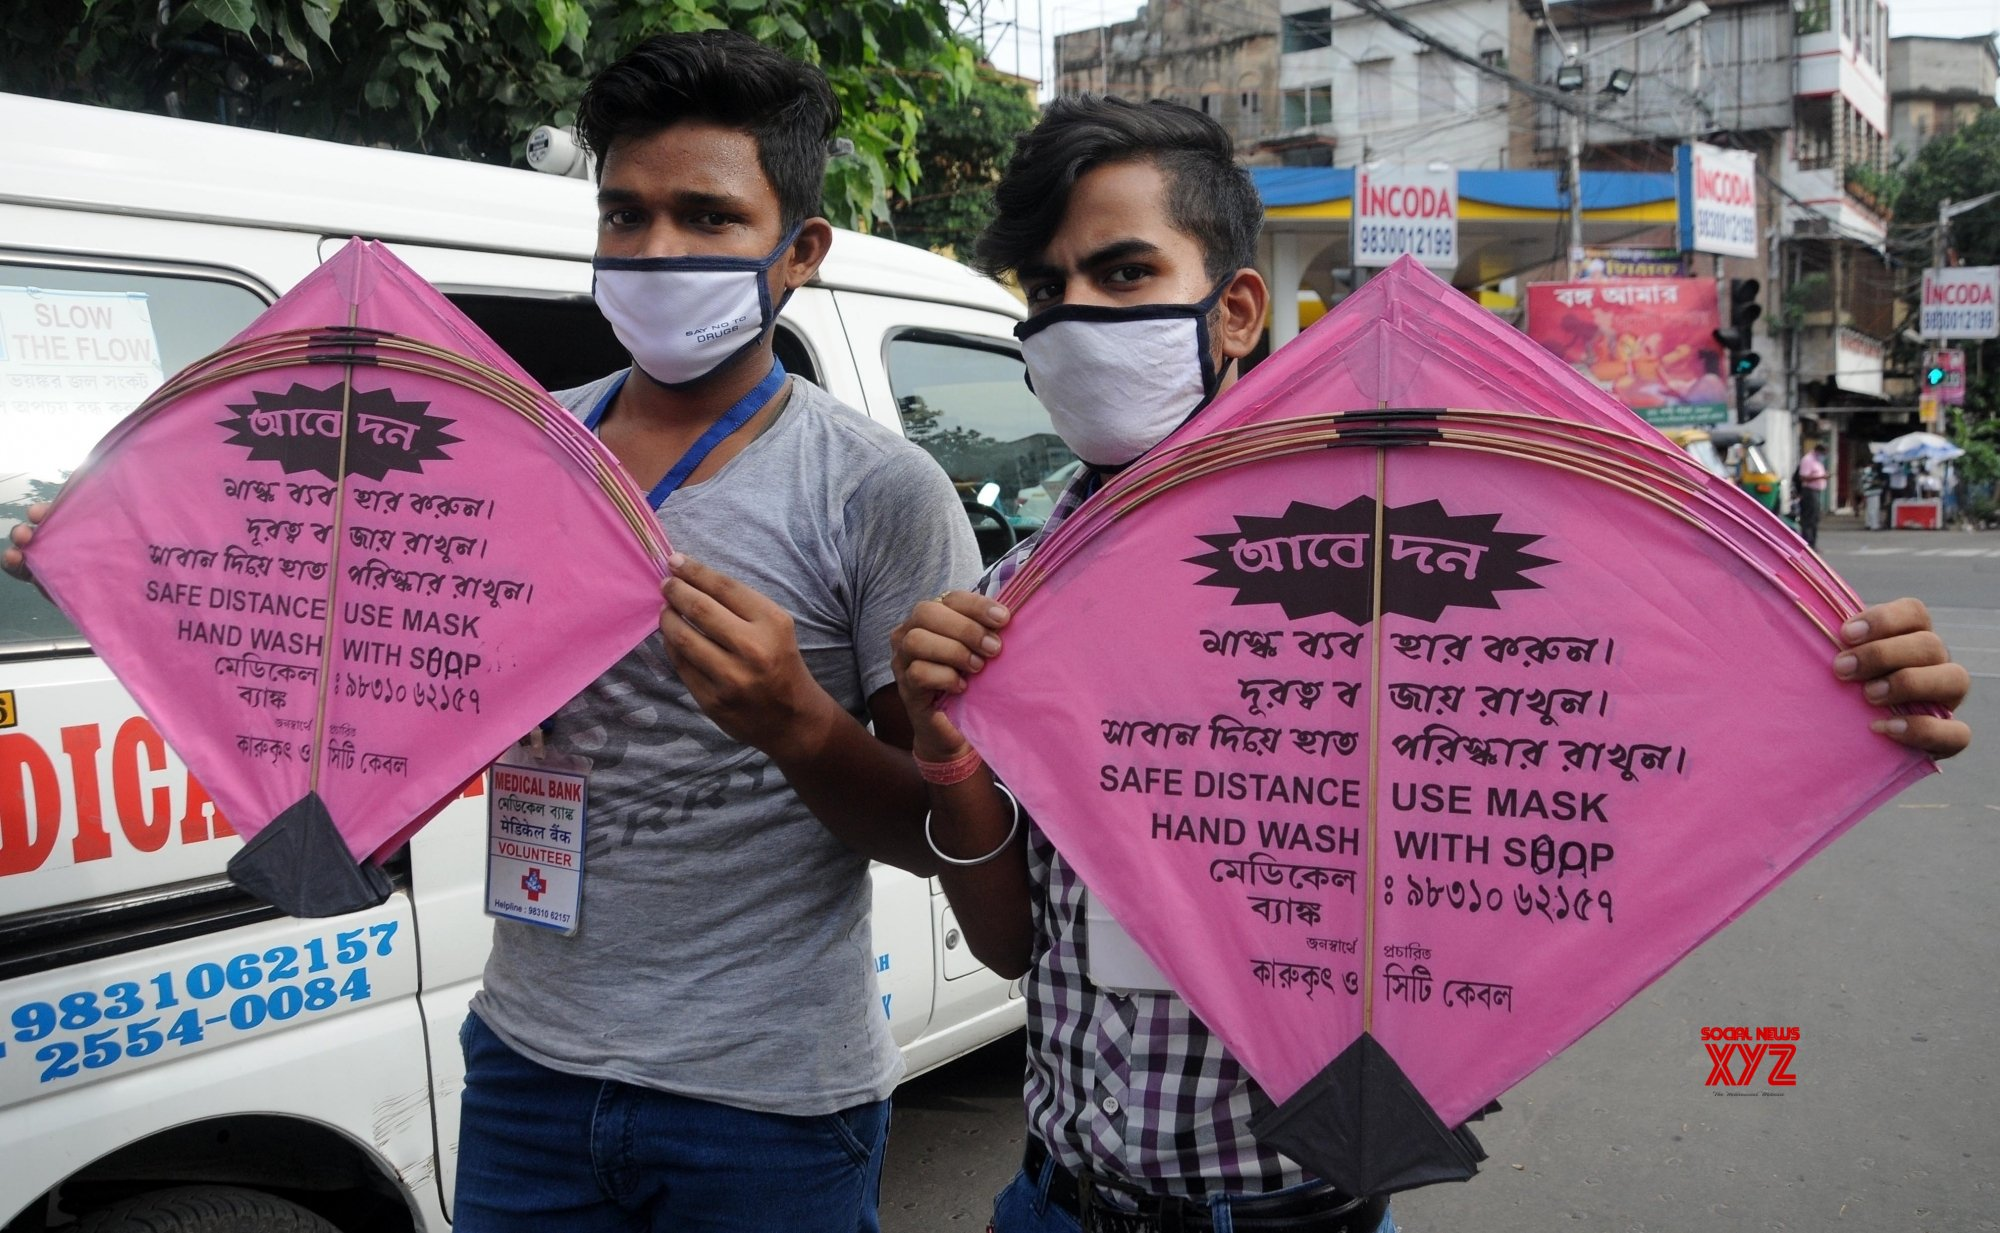 Kolkata: Kites being used to spread awareness on COVID - 19 ahead of Vishwakarma Puja celebrations #Gallery